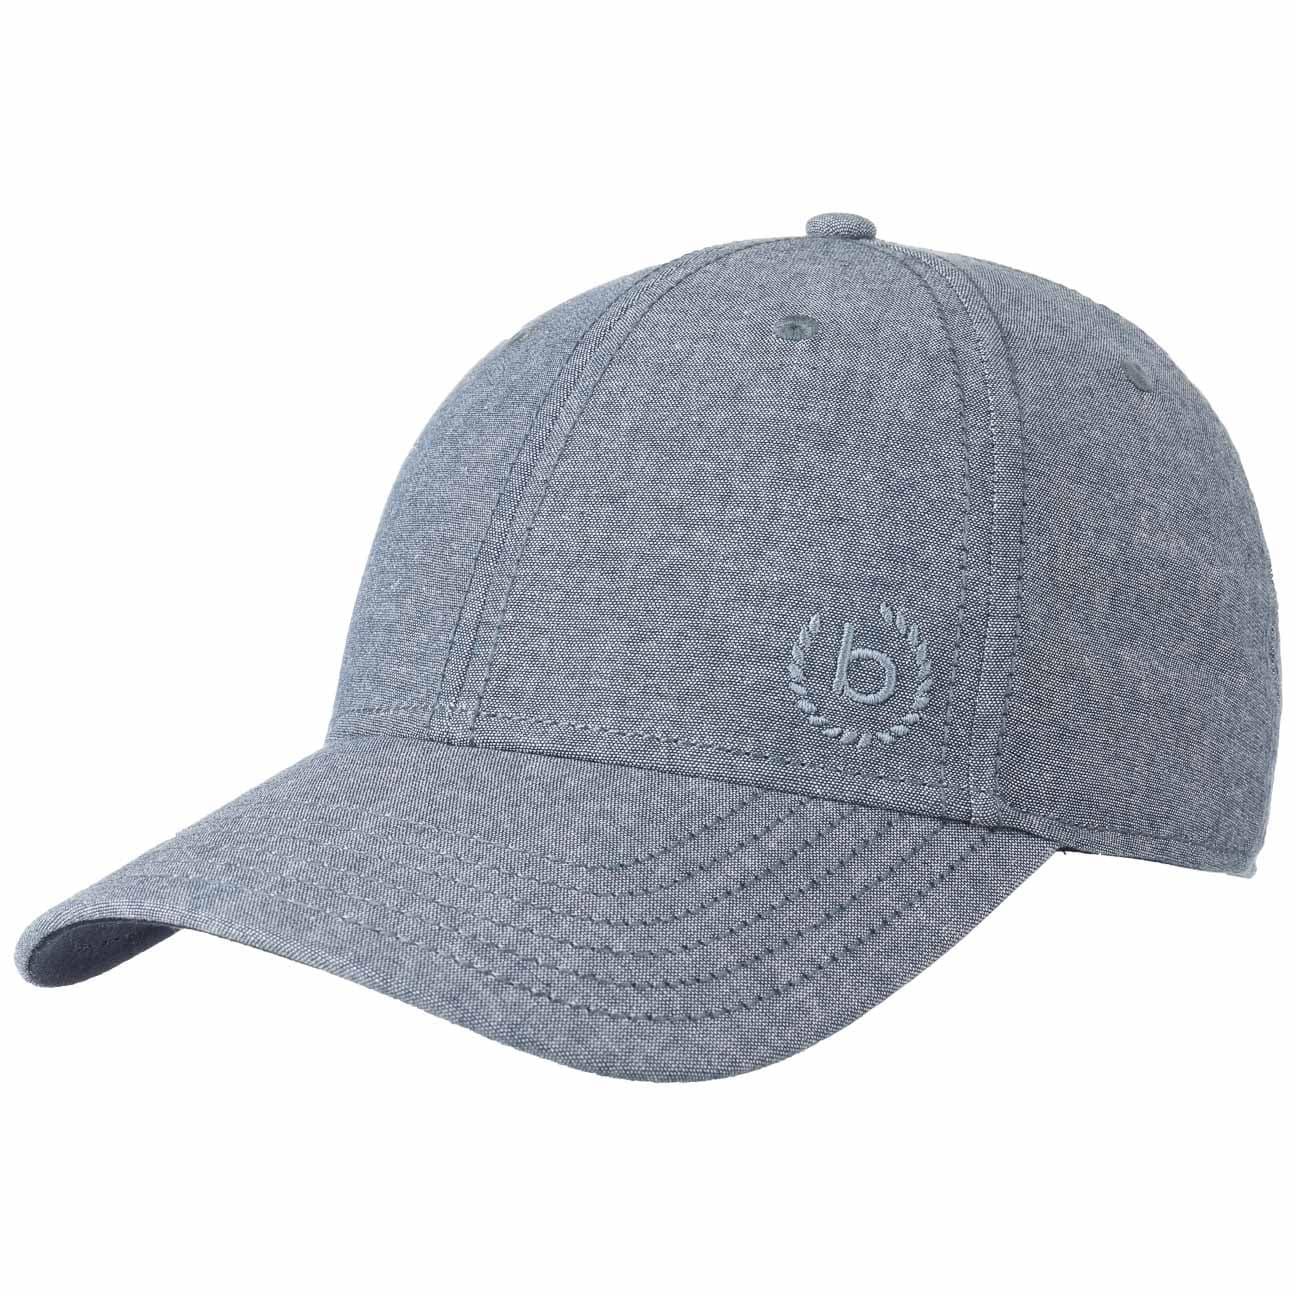 Casquette Cotton Basic by bugatti  baseball cap